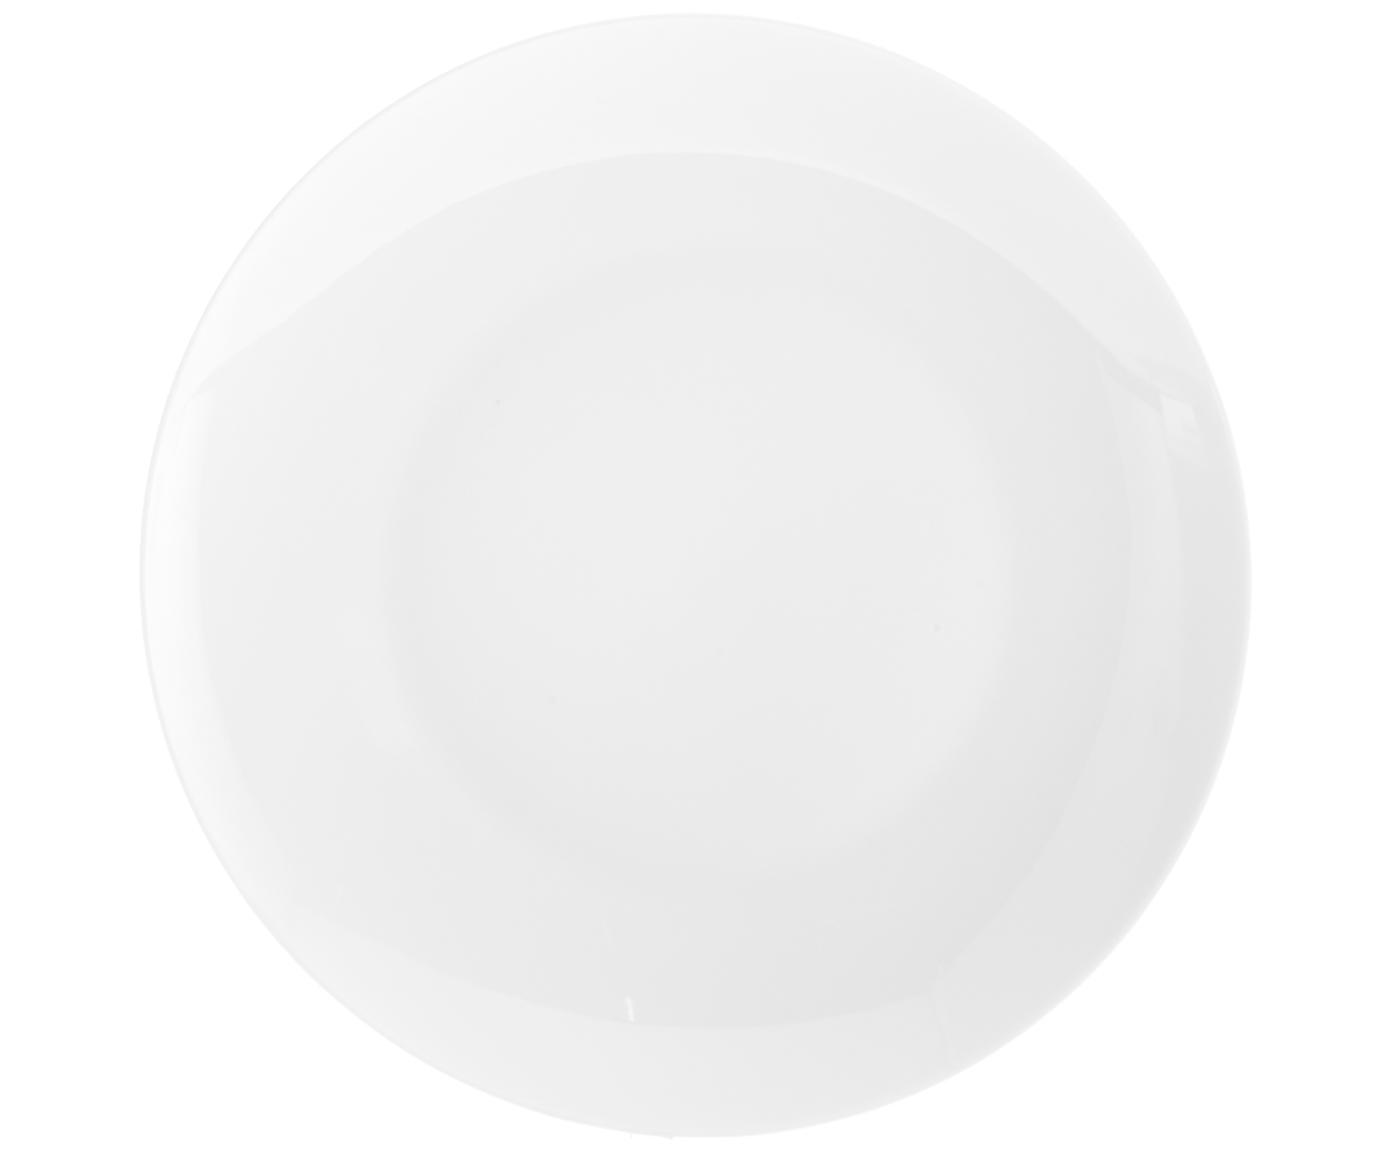 Platos llanos Delight Modern, 2uds., Porcelana, Blanco, Ø 27 cm